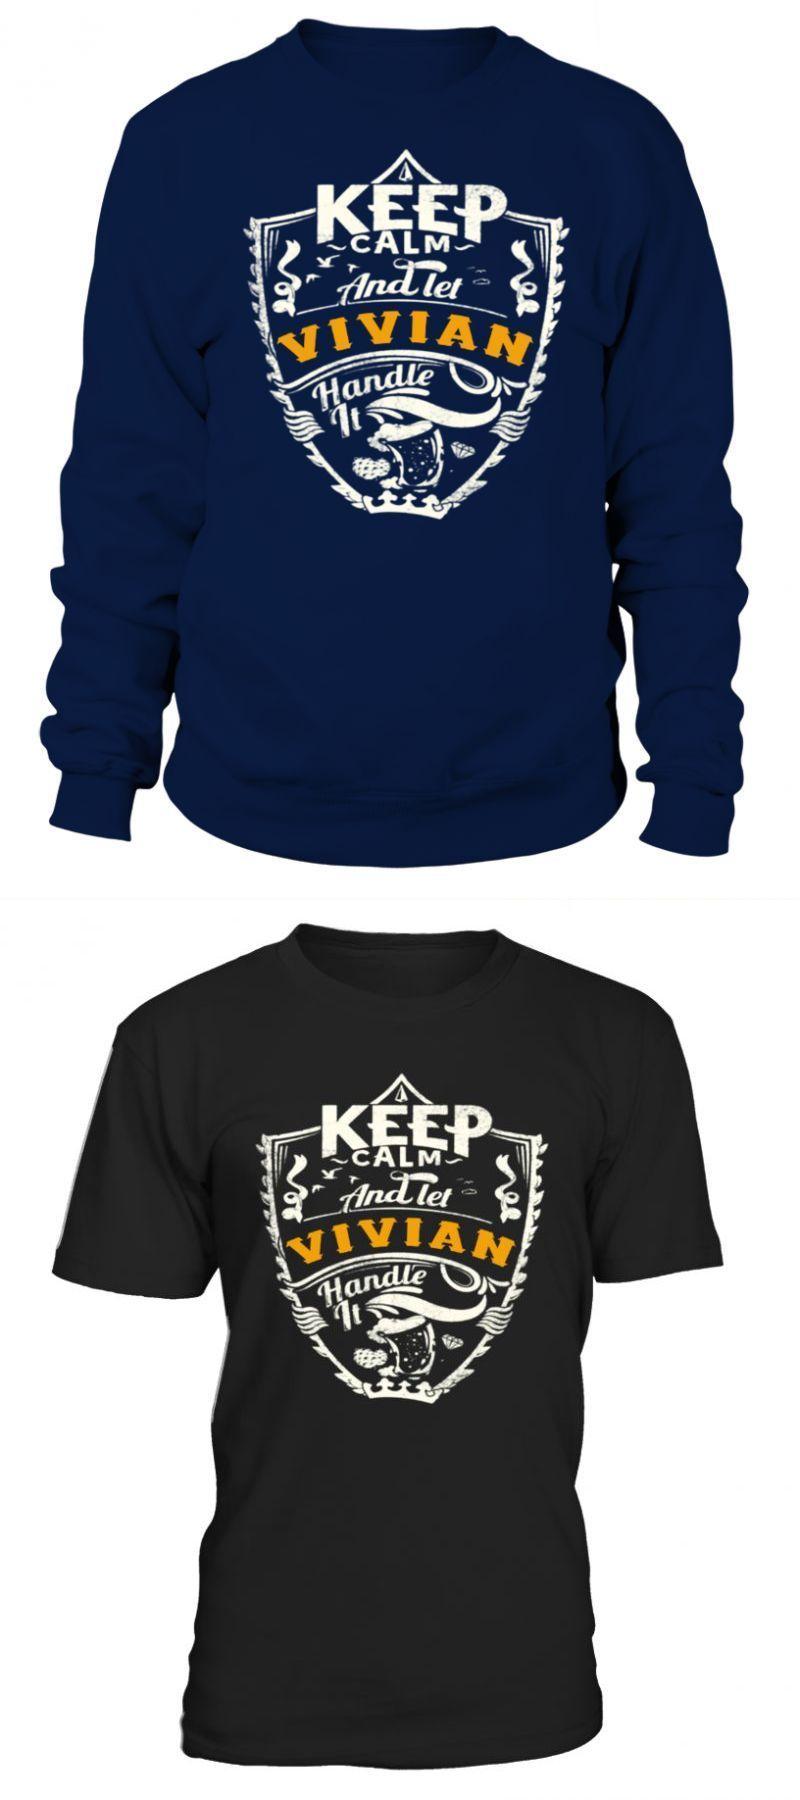 Color vivaan tshirt vivian make own tshirt with vivaan